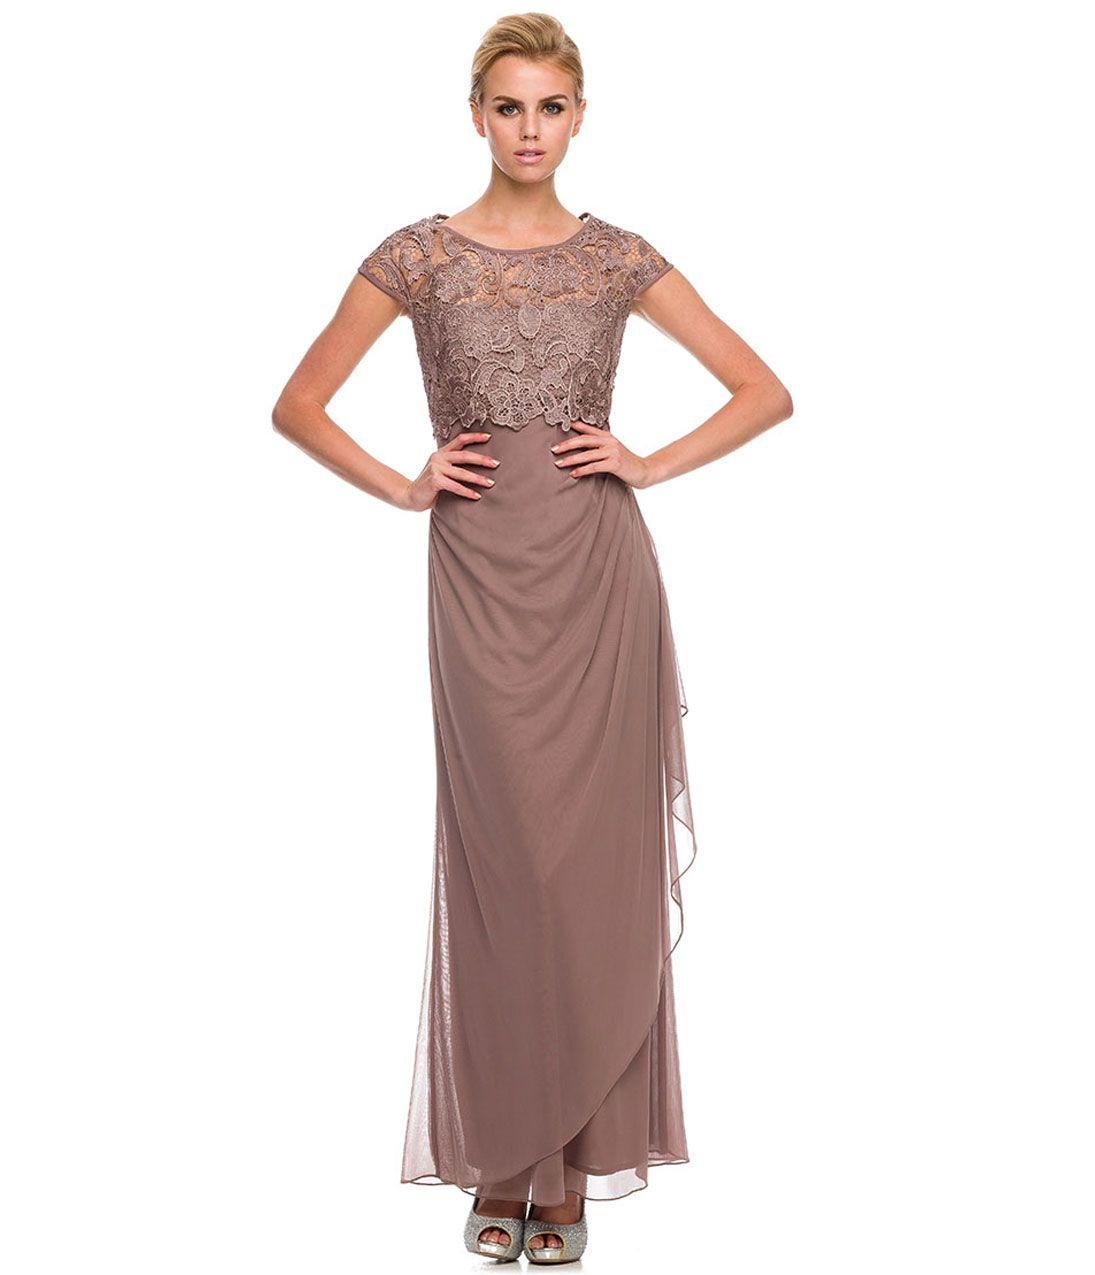 S formal dresses modest long dresses downton abbey fashion